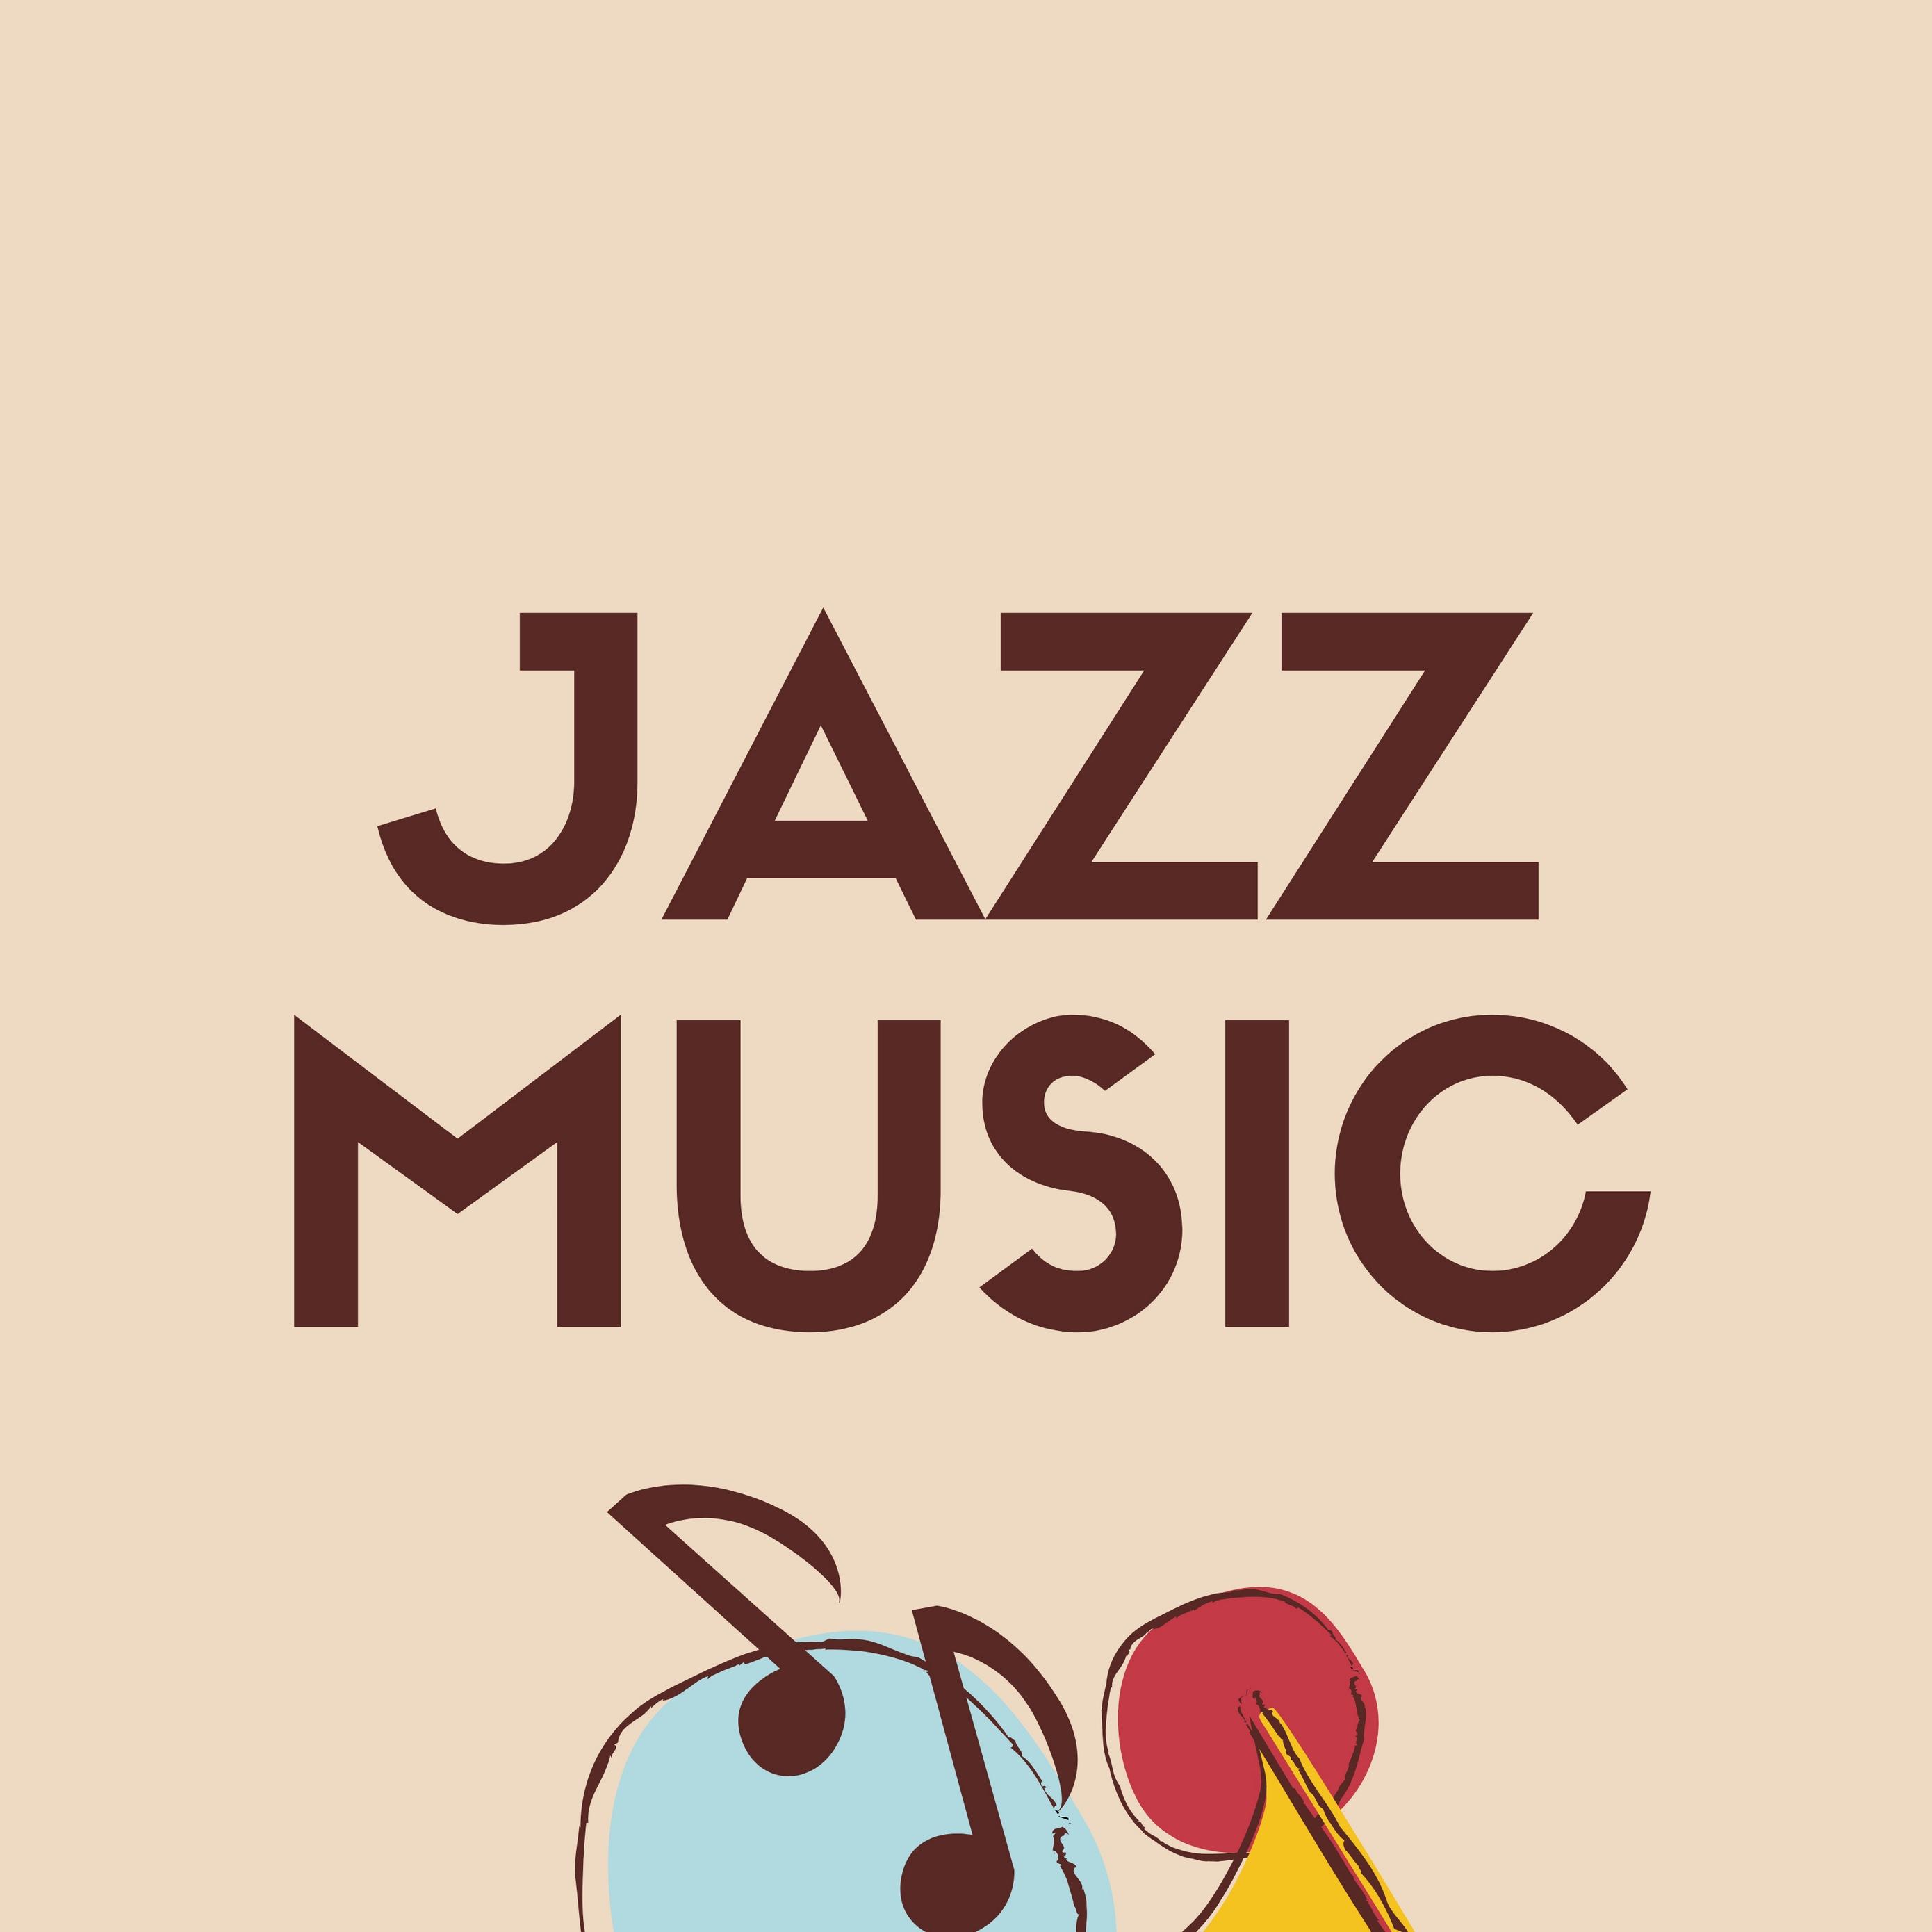 Download wallpaper 2780x2780 jazz music musical instrument ipad 2780x2780